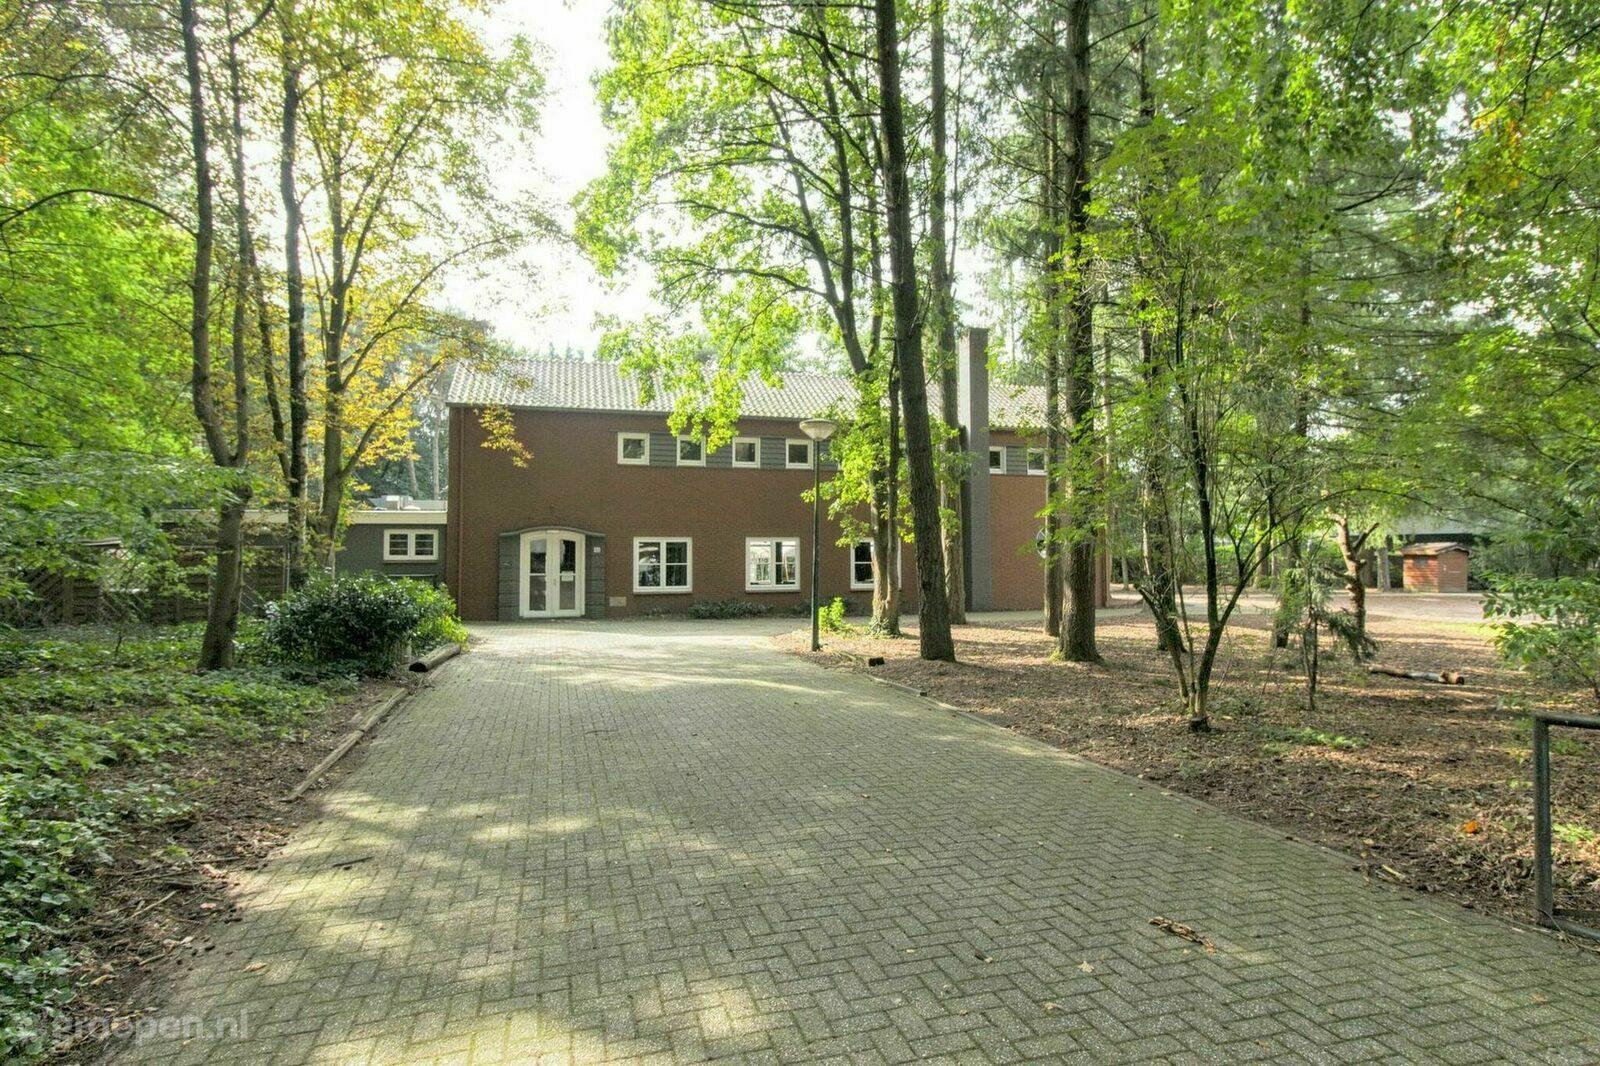 Group accommodation Putten